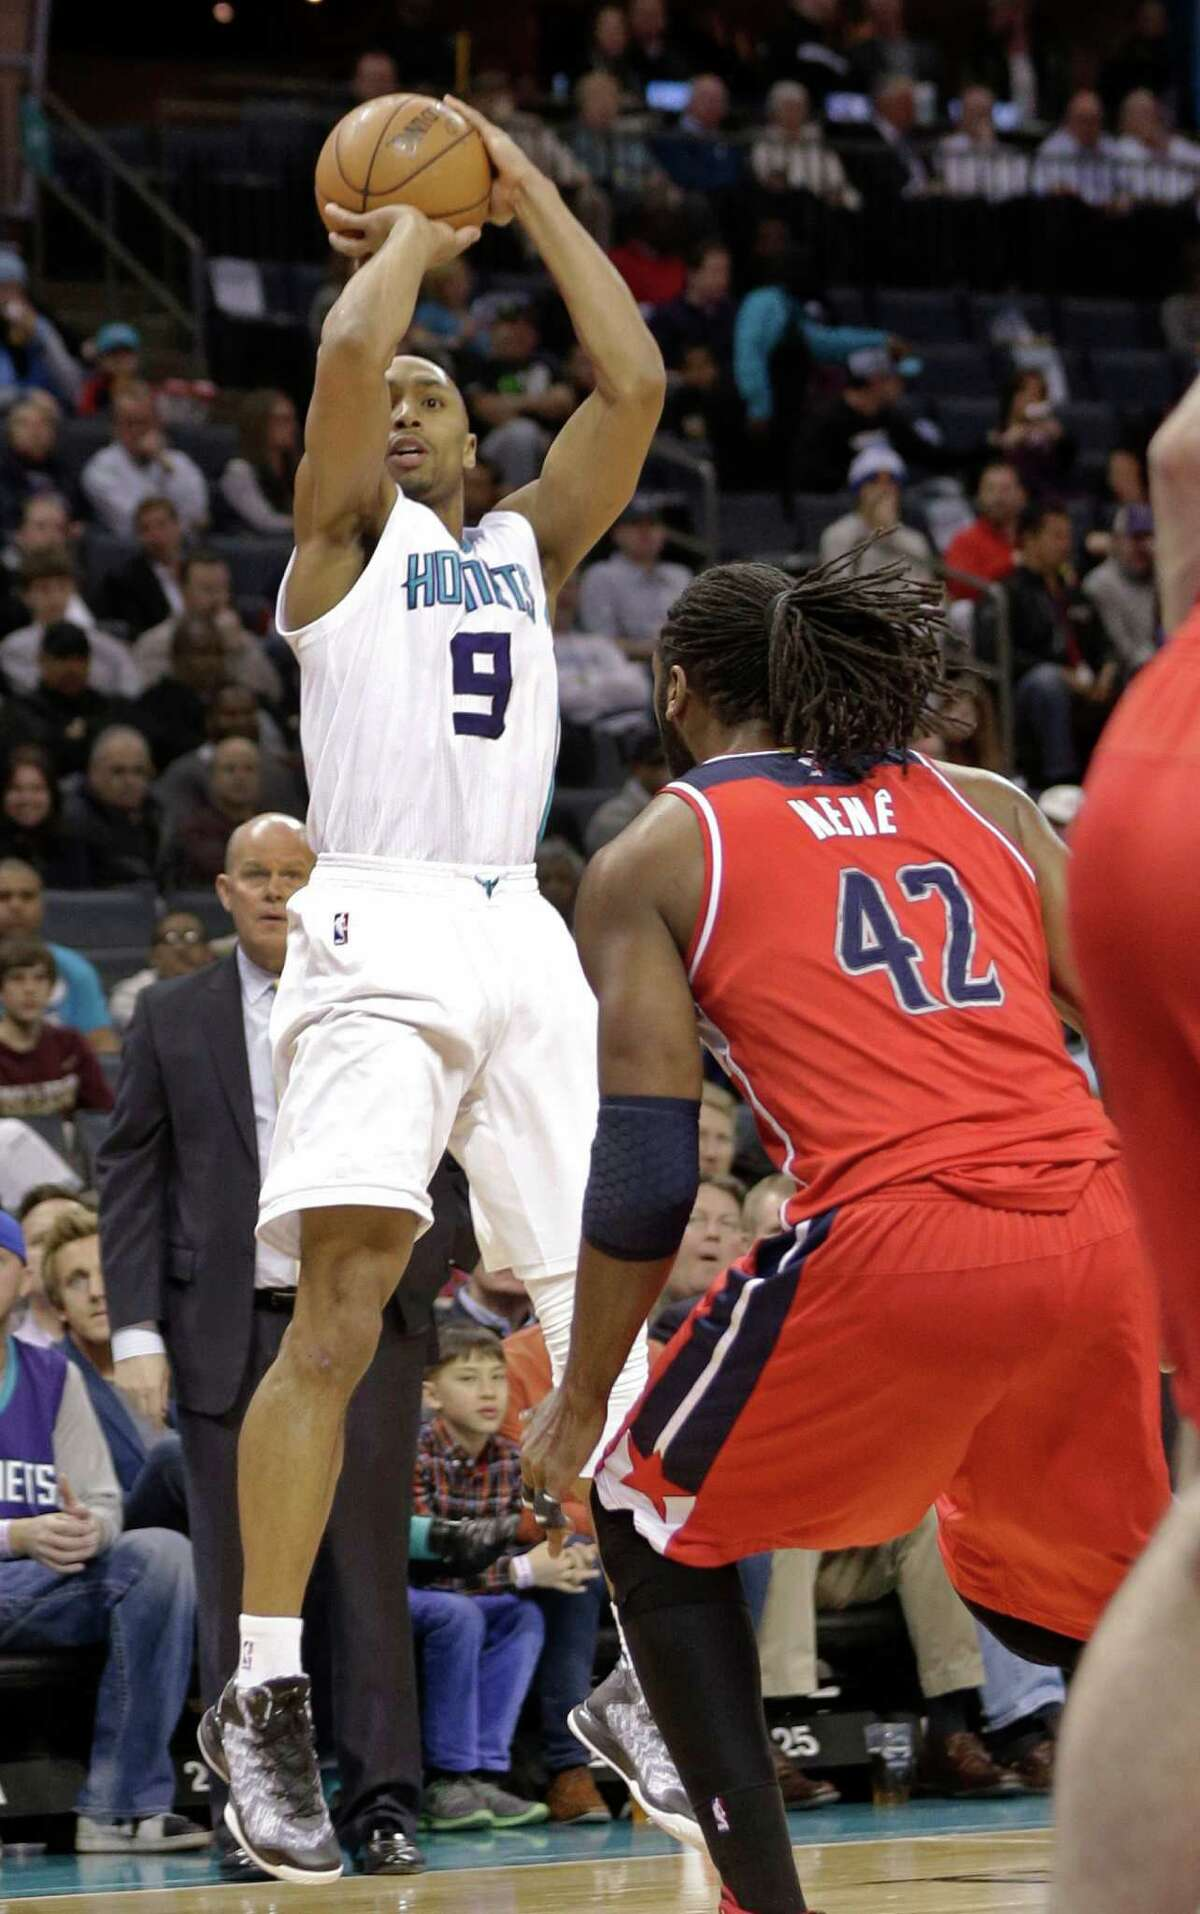 Charlotte Hornets' Gerald Henderson (9) shoots over Washington Wizards' Nene (42) during the first half of an NBA basketball game in Charlotte, N.C., Thursday, Feb. 5, 2015. (AP Photo/Chuck Burton) ORG XMIT: NCCB104